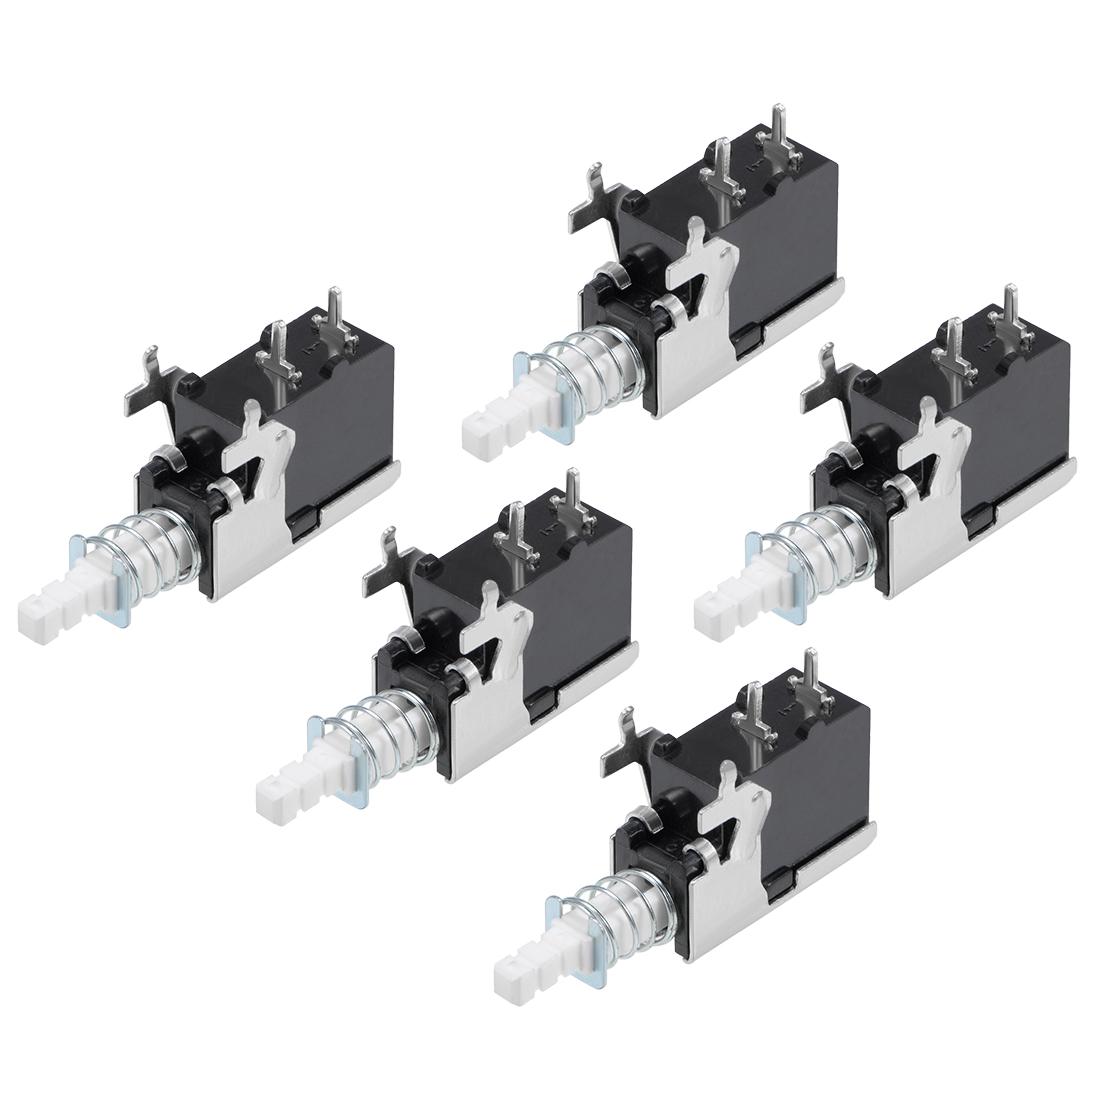 Push Button Switch 8A 250V SPST 2 Pin 1 Position Self-Locking Black 5pcs